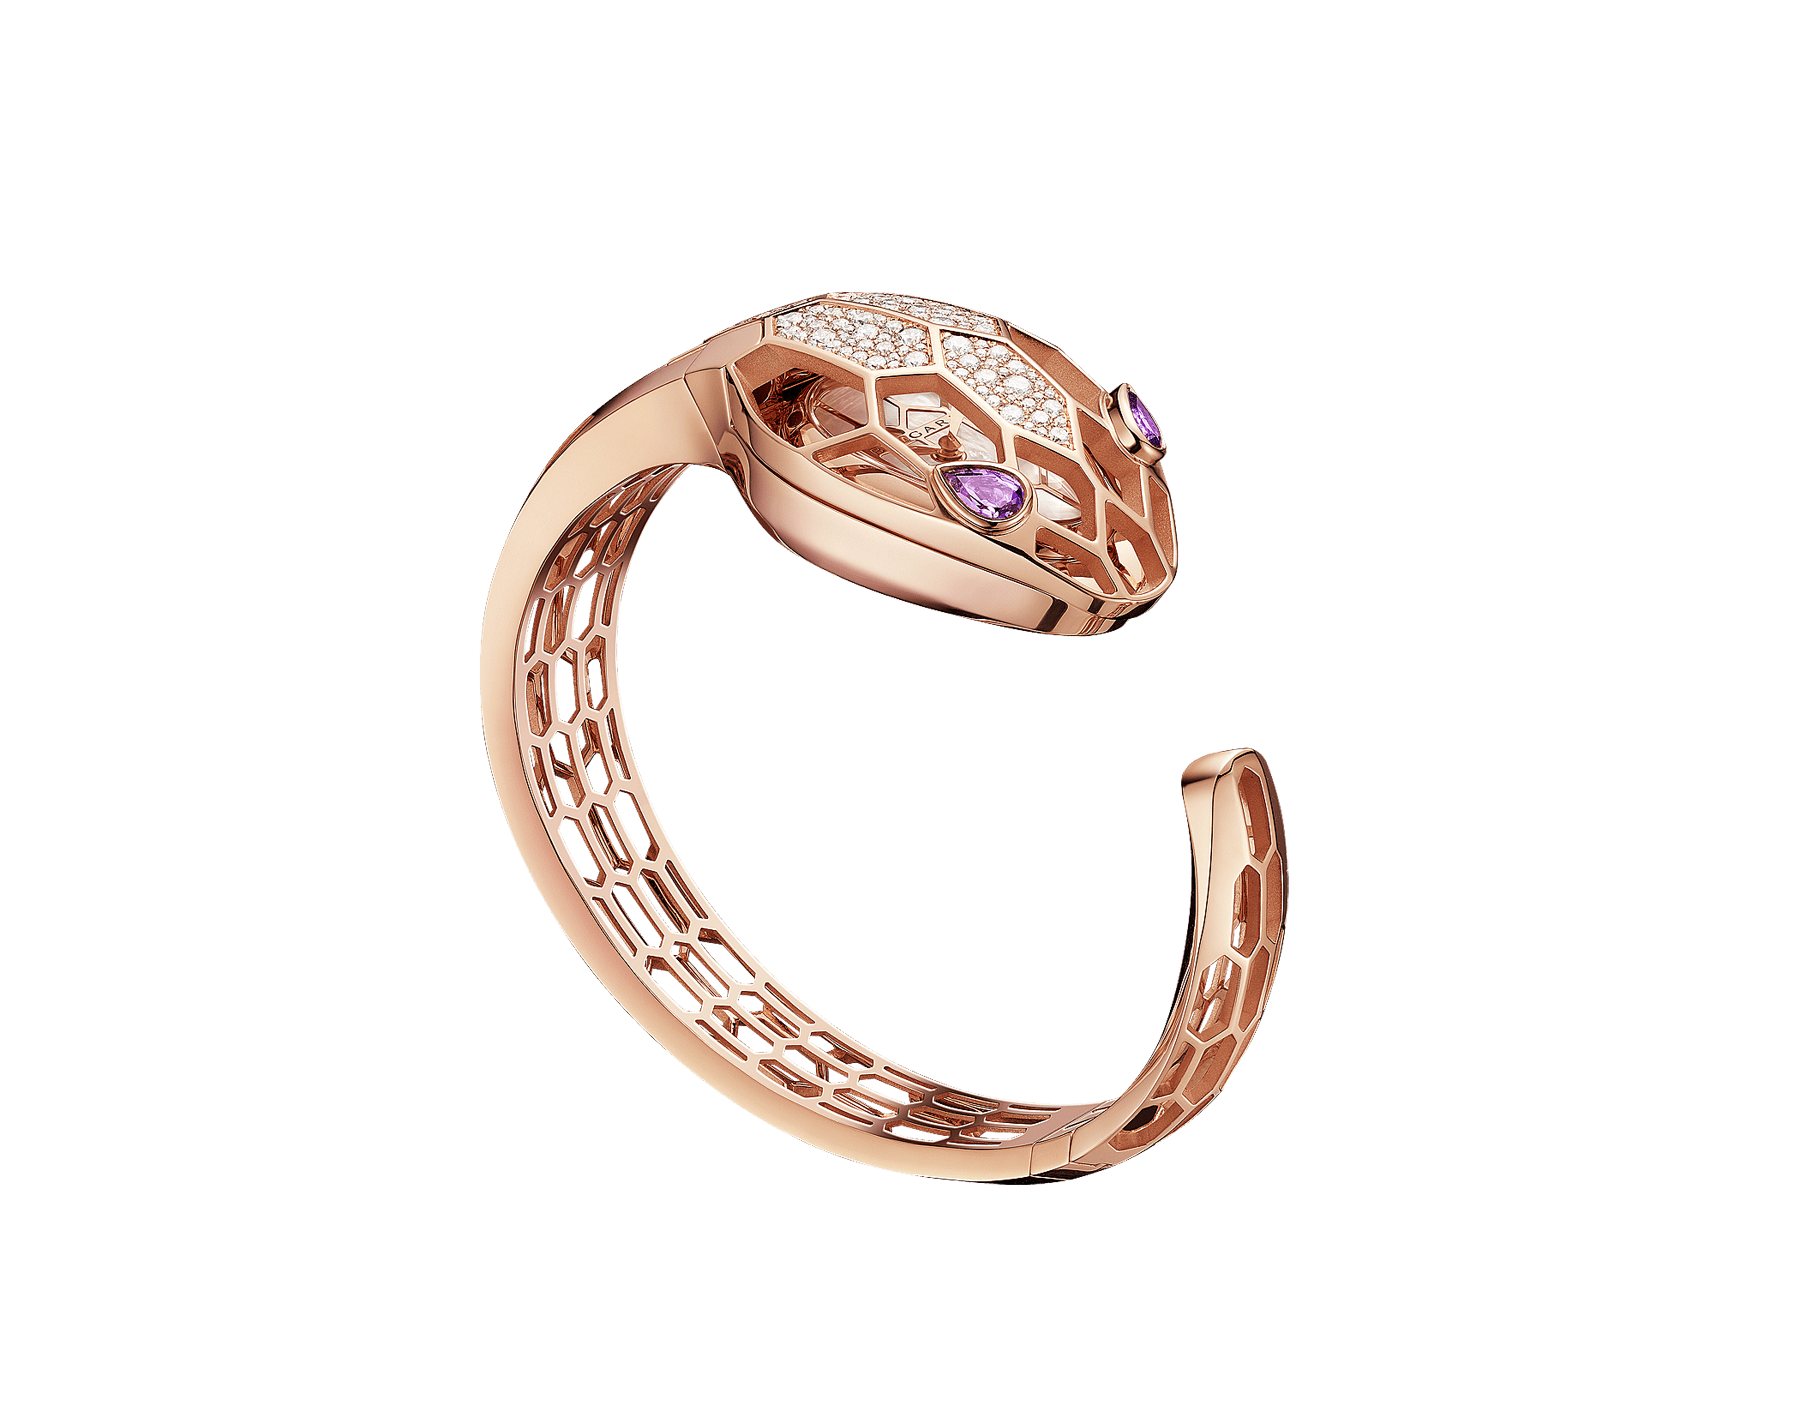 Serpenti Misteriosi Secret 腕錶,18K 玫瑰金鏤空錶殼鑲飾圓形明亮型切割鑽石,白色珍珠母貝錶盤,18K 玫瑰金鏤空手鐲式錶帶,蛇眼鑲飾梨形紫水晶。M 尺寸。 SrpntMister-SecretWtc-rose-gold image 3